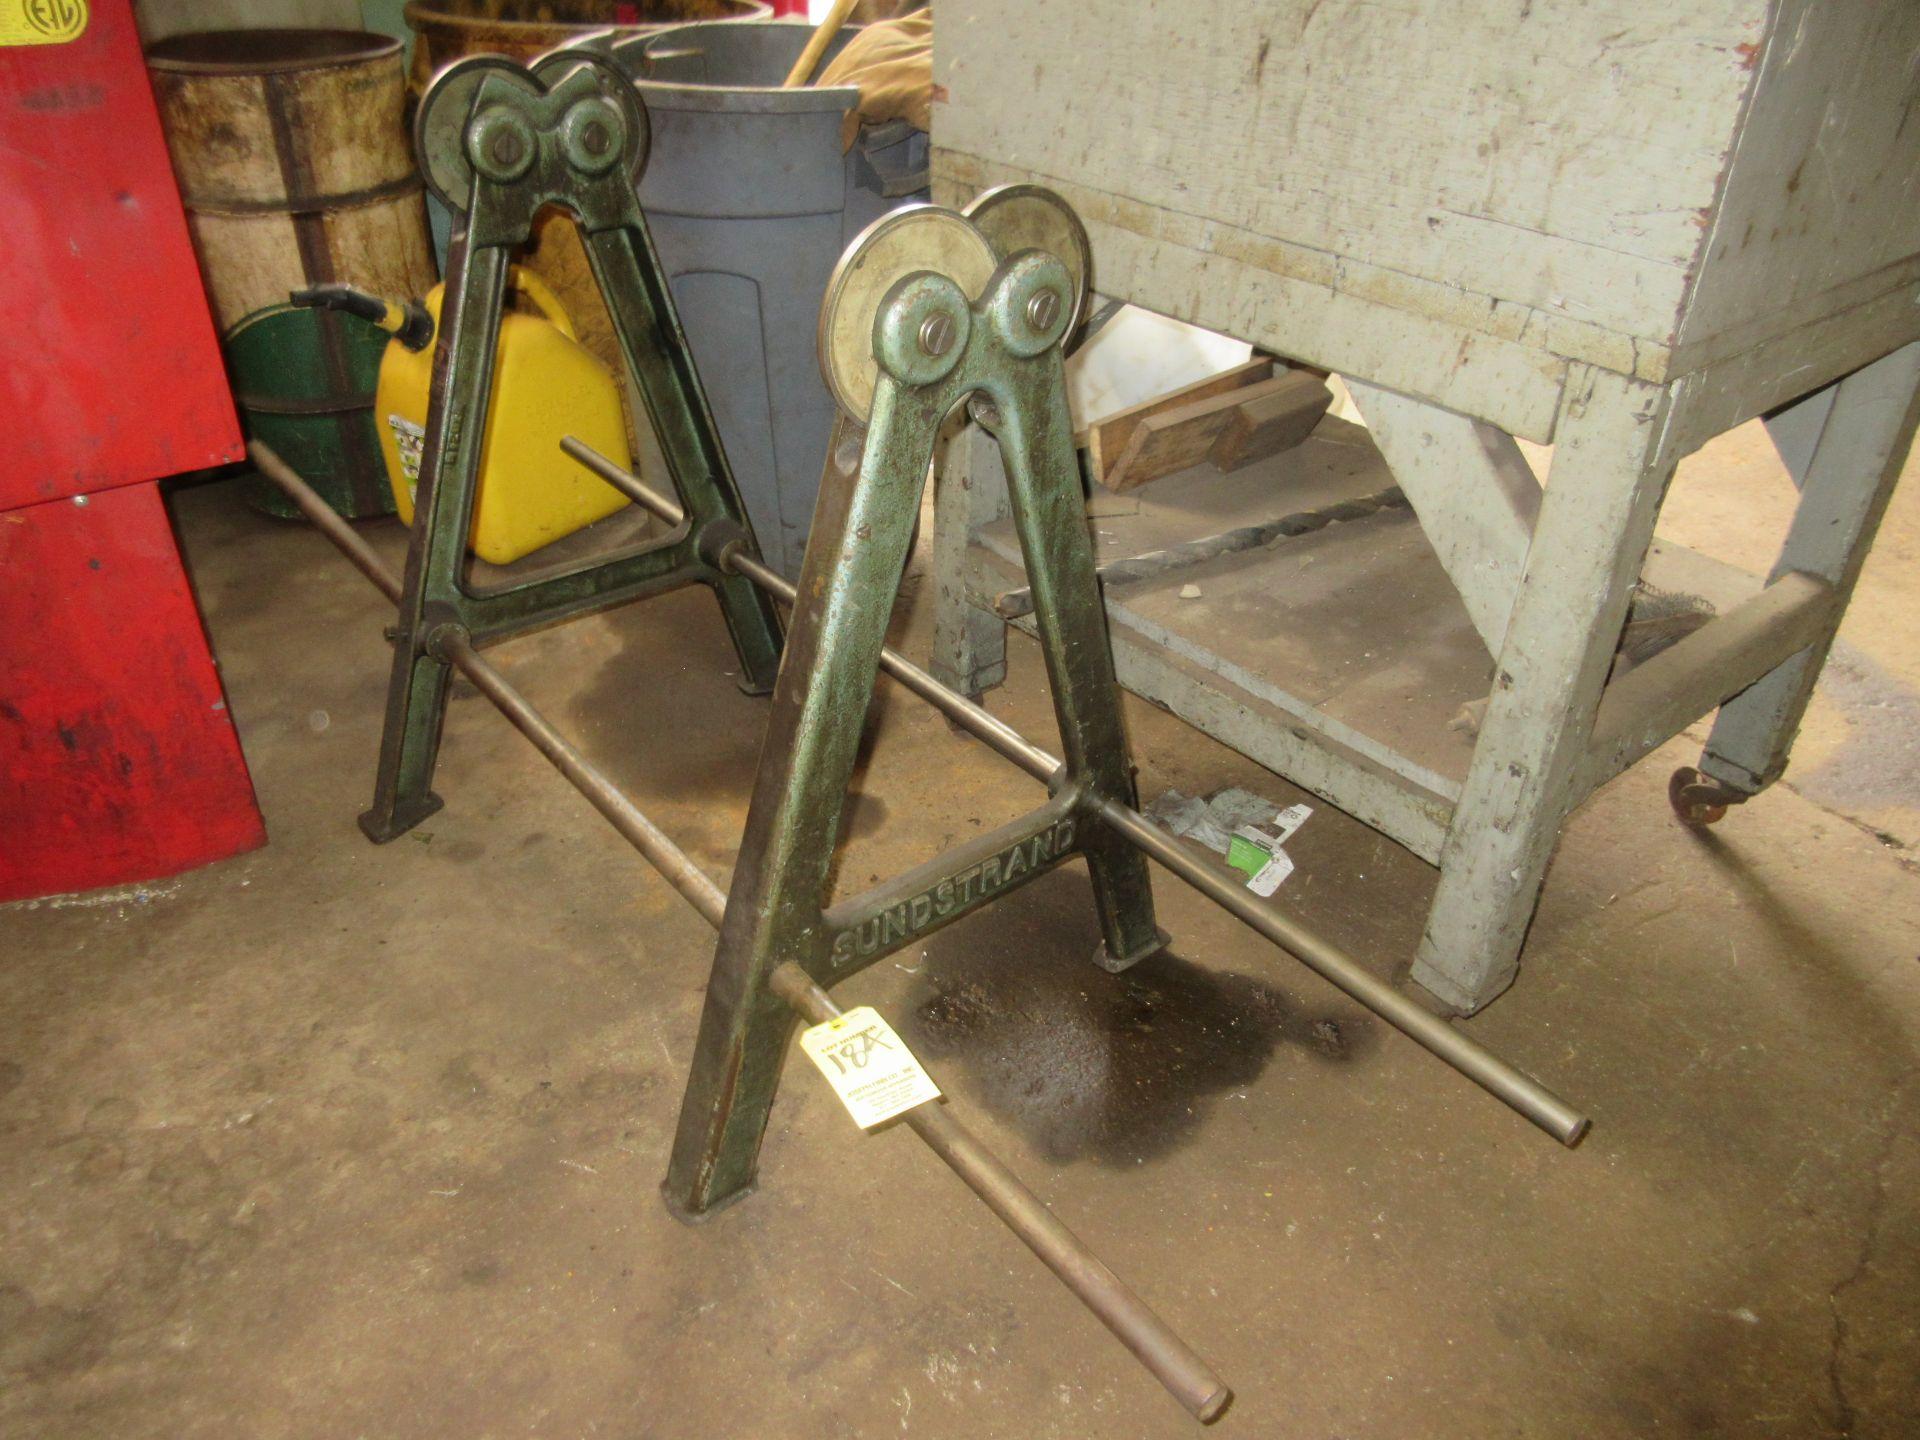 (1) Sundstrand (Wheel Balancer) Static Balancing Unit